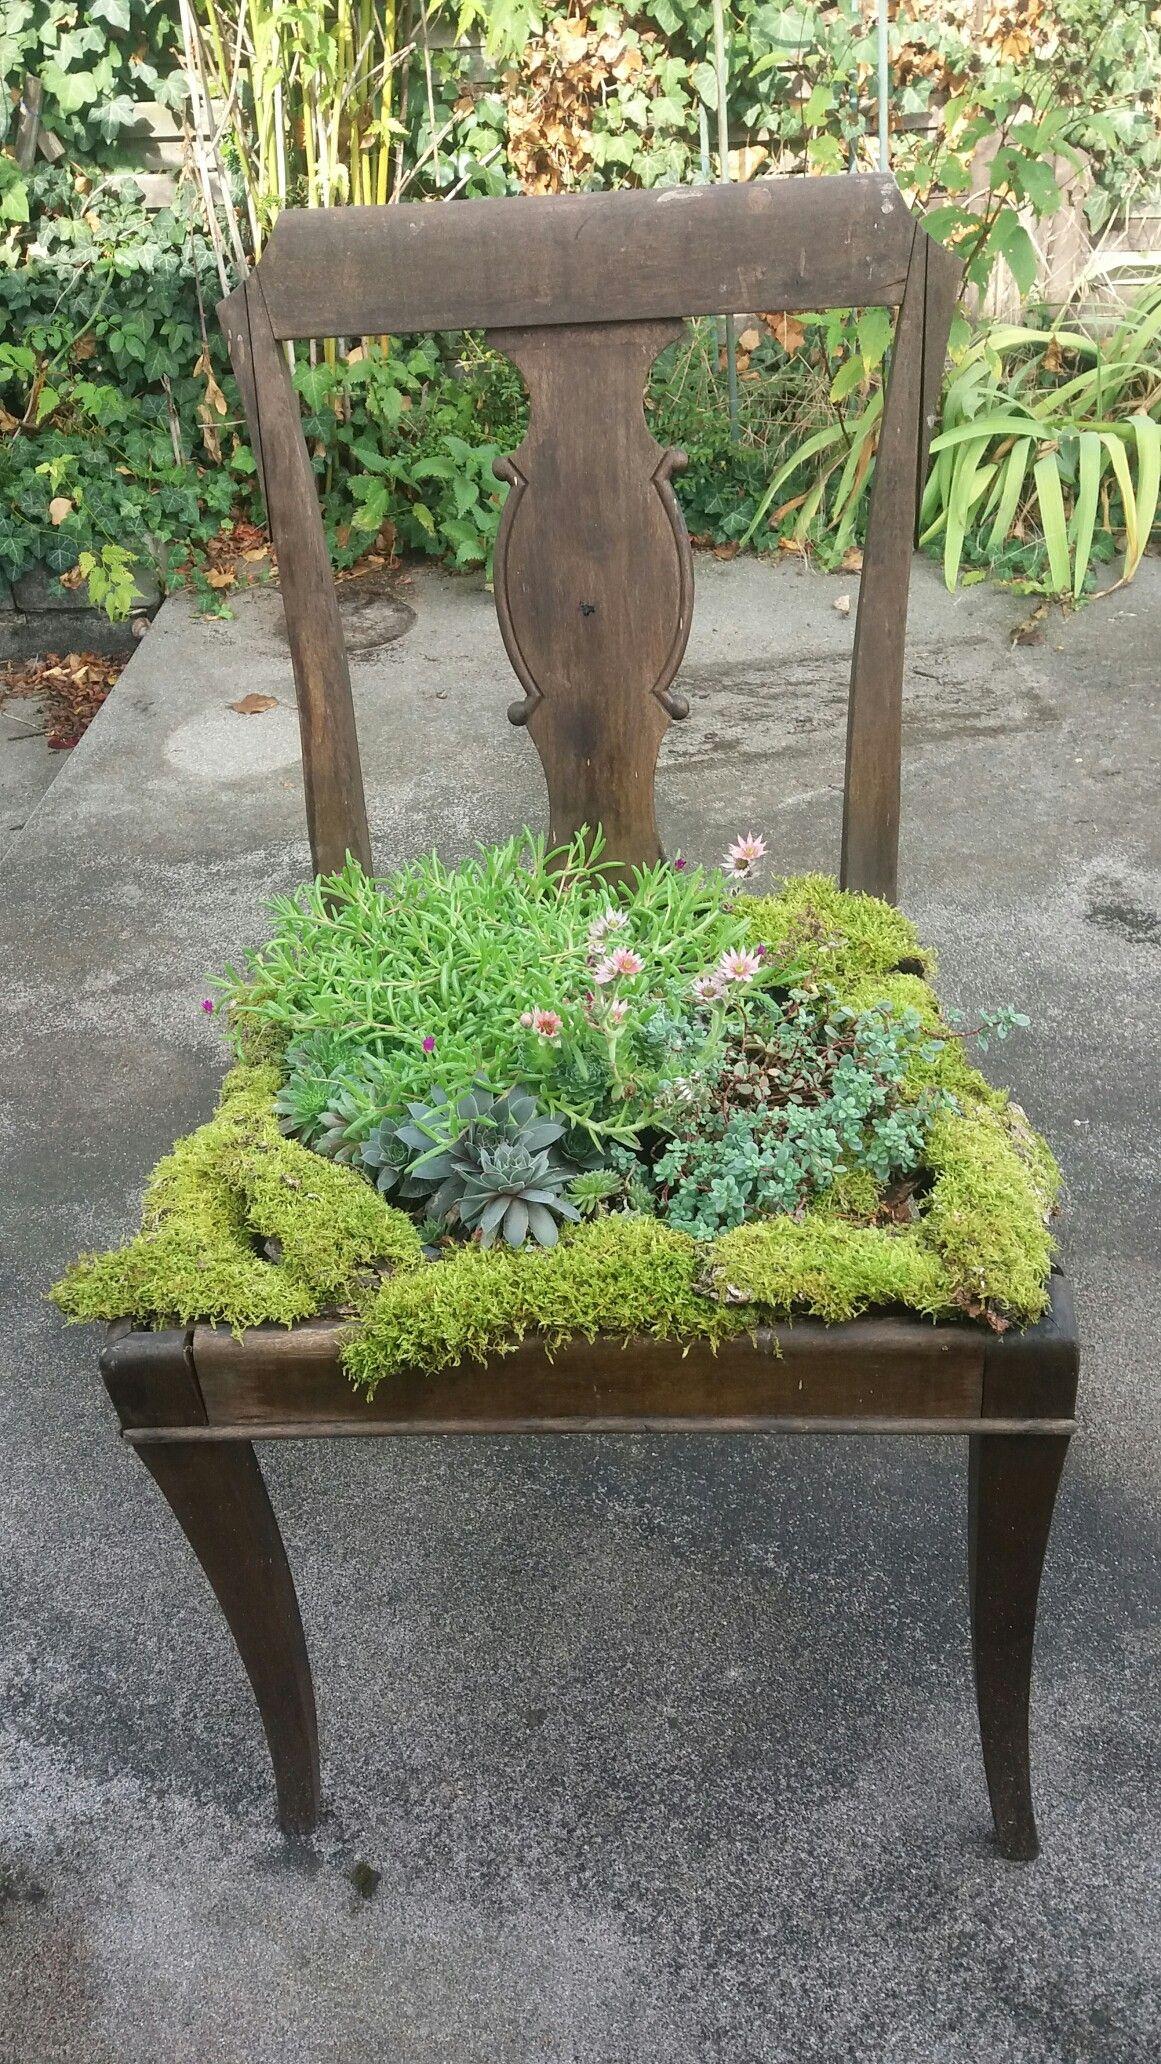 Bepflanzter Stuhl Garten Deko Garten Gartengestaltung